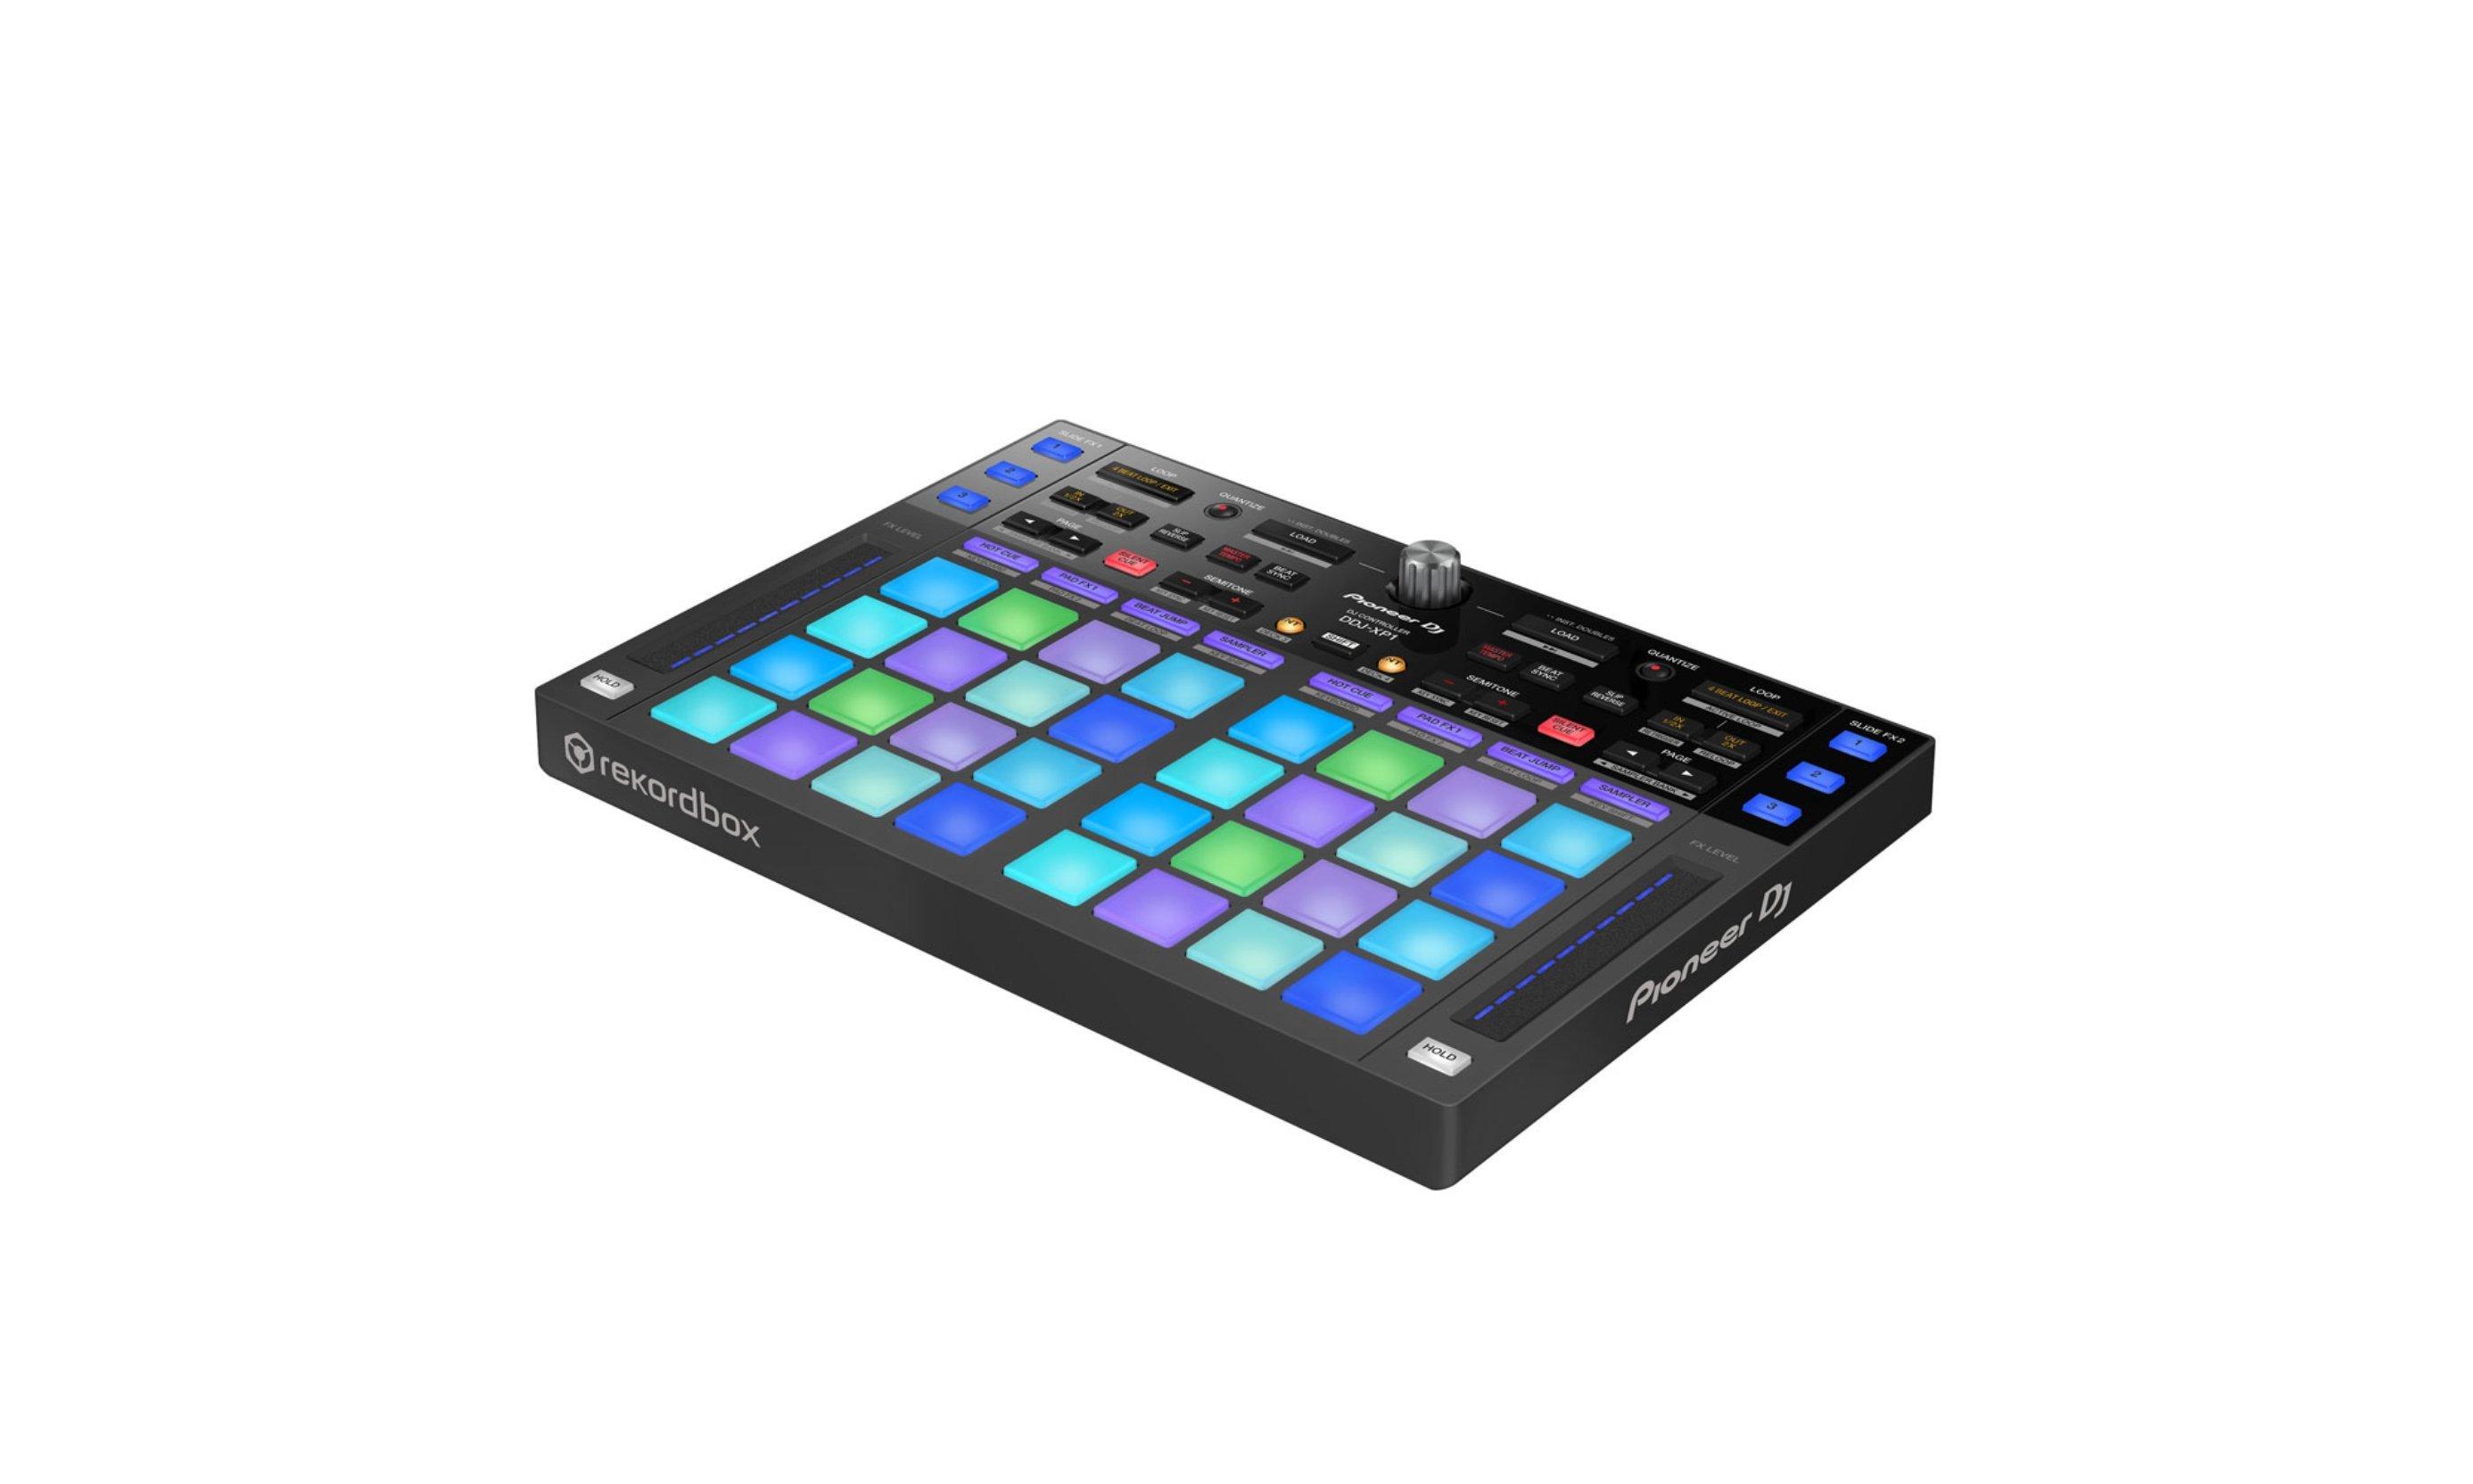 Neu: Pioneer DDJ-XP1 - Pad-Controller für Rekordbox DJ & DVS